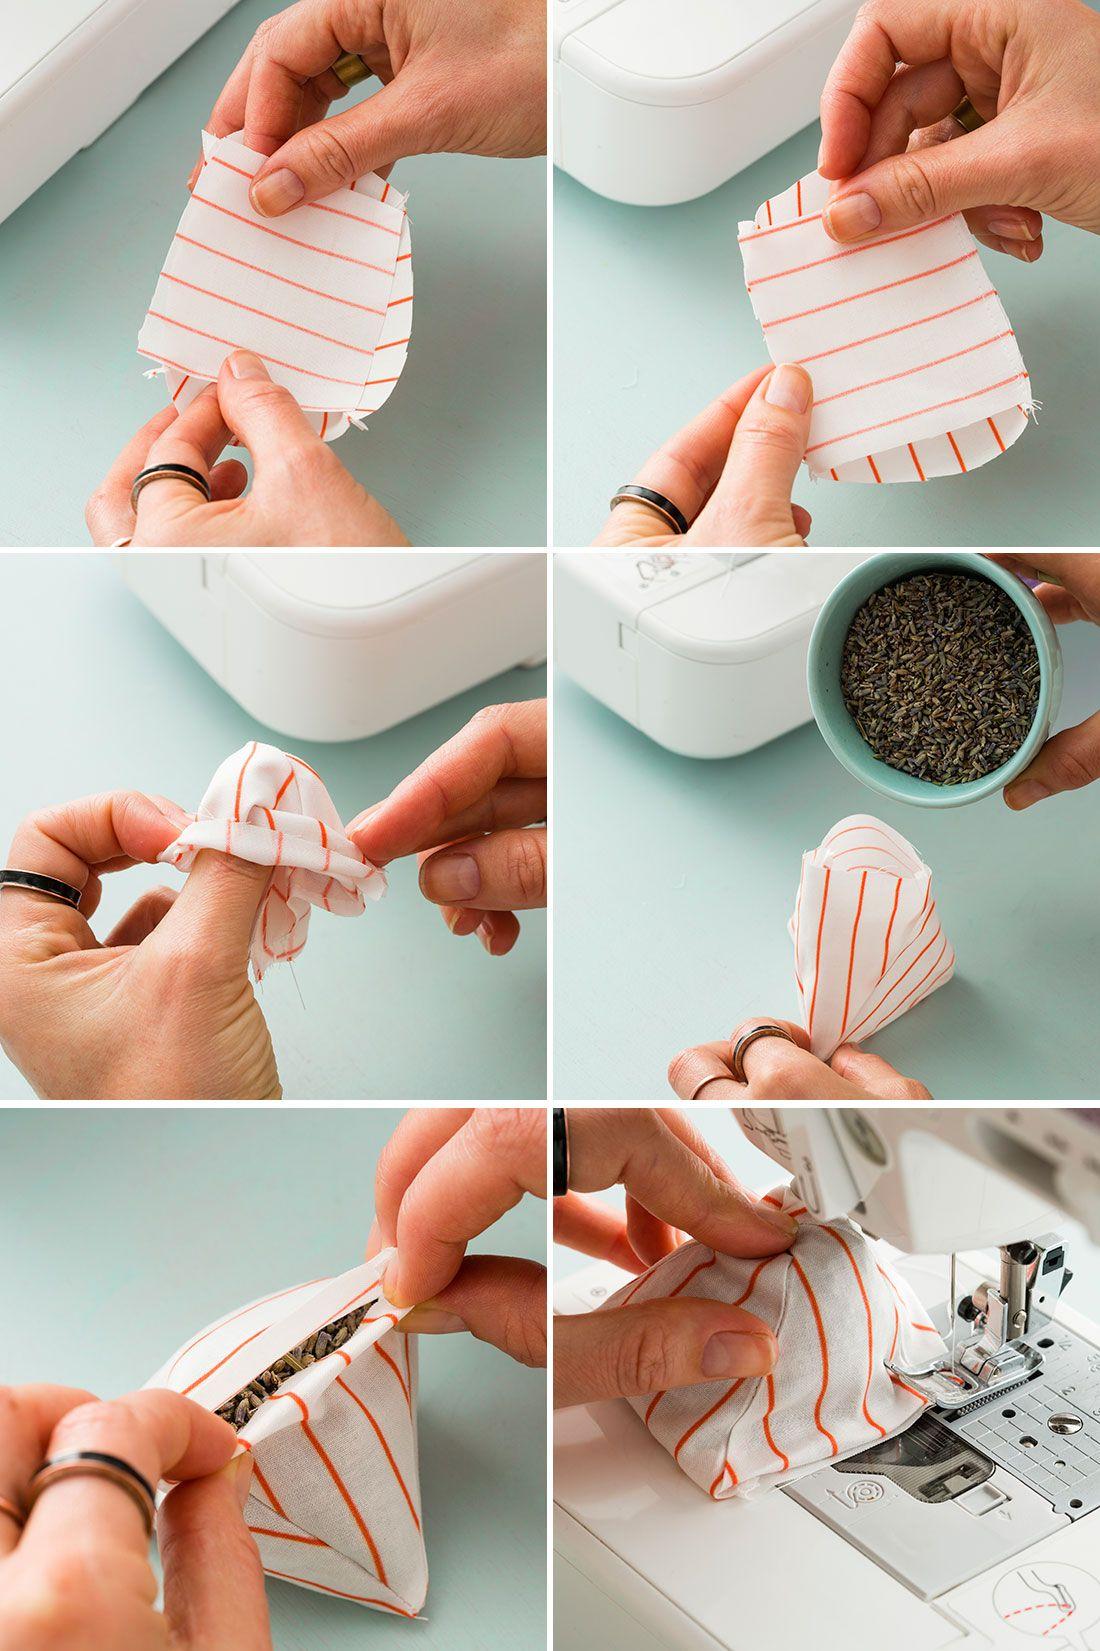 Freshen up your gym bag with a DIY Lavender Sachet.